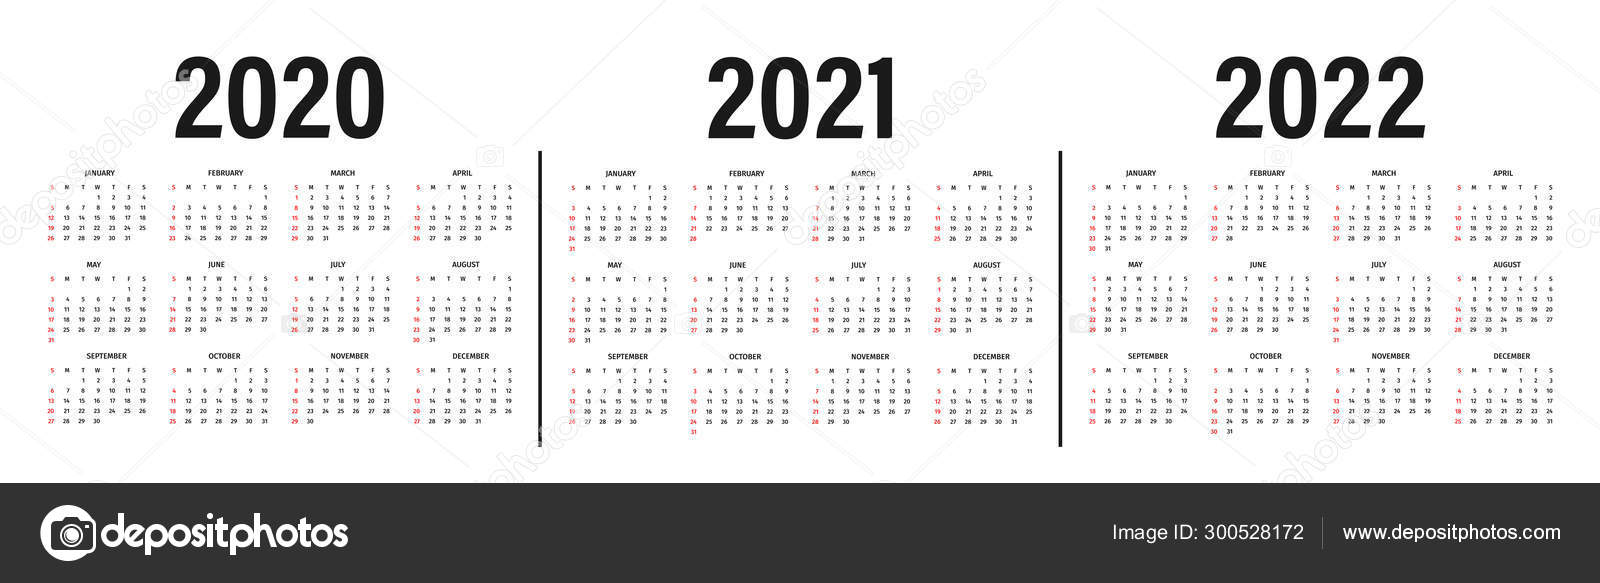 Calendar 2020, 2021 and 2022 template. Calendar mockup design in